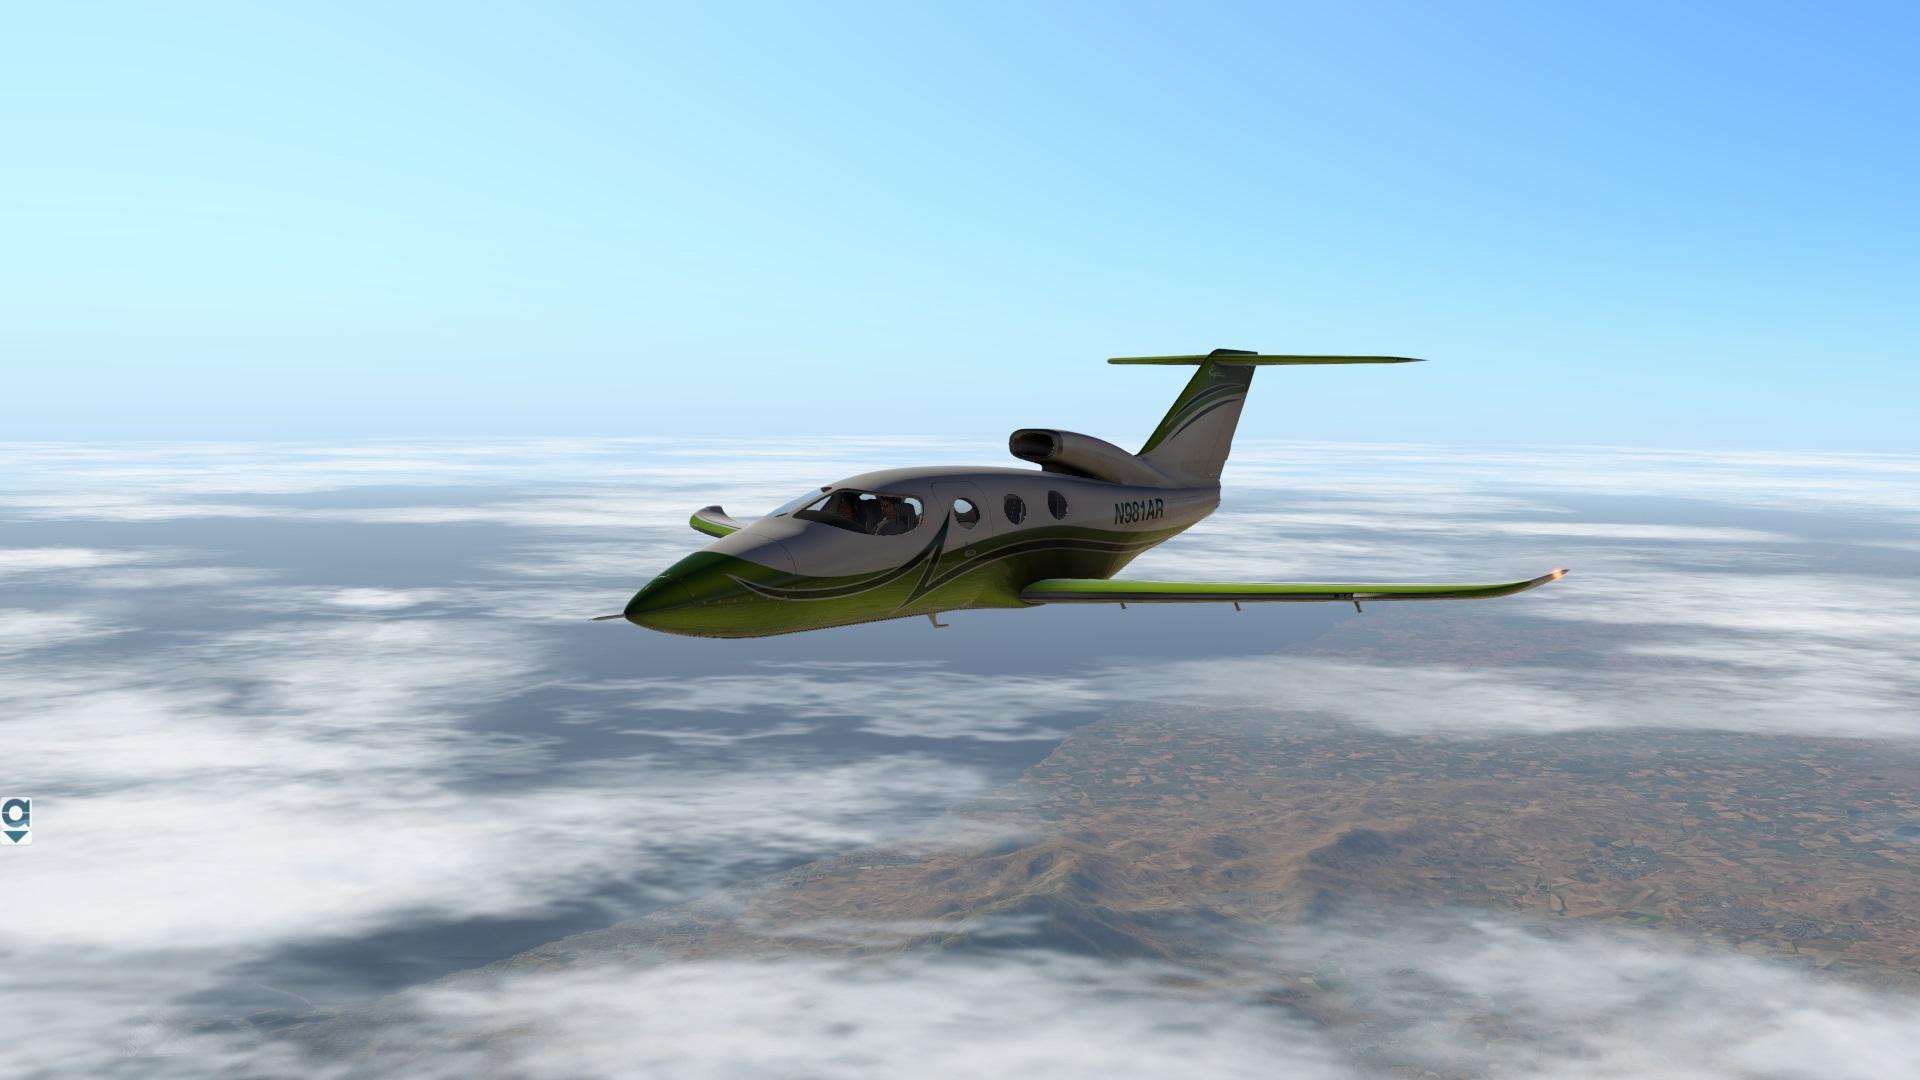 Monday Screenshots with X-Plane 10/11 - Page 2 - Screenshots